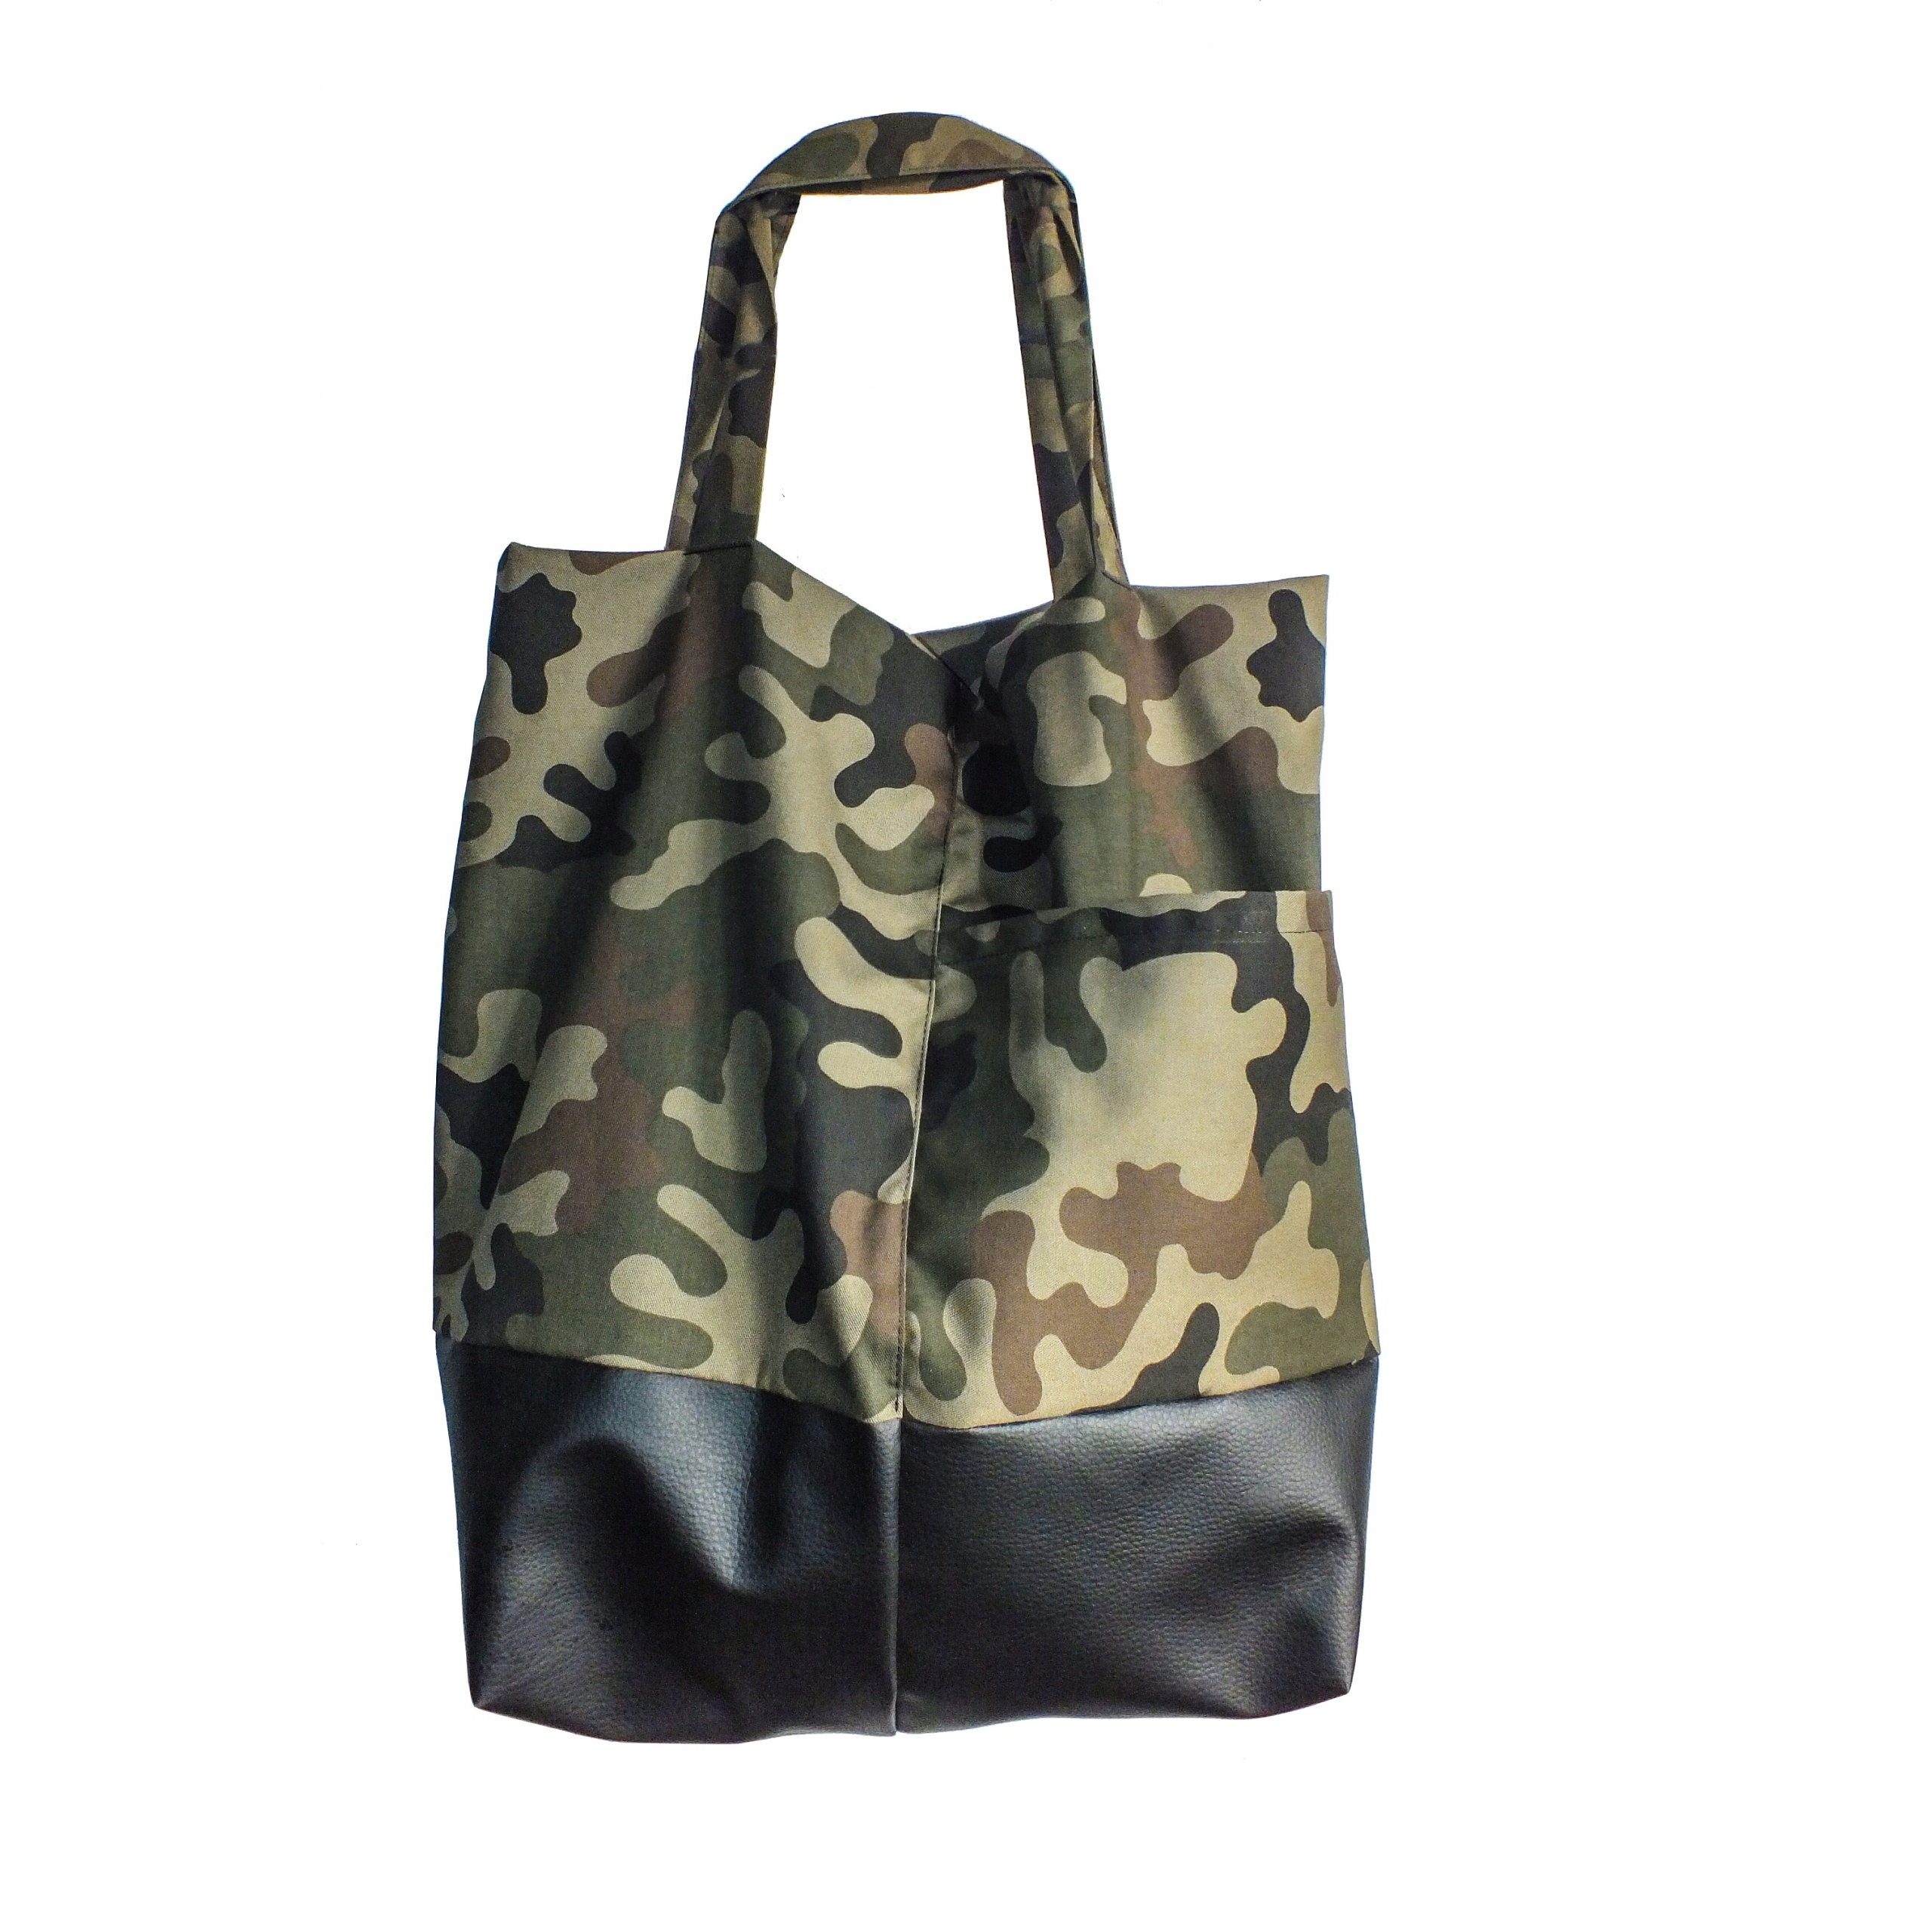 bff2f8cff2aae torba torebka shopper moro khaki militarny pojemna - 7712064409 ...